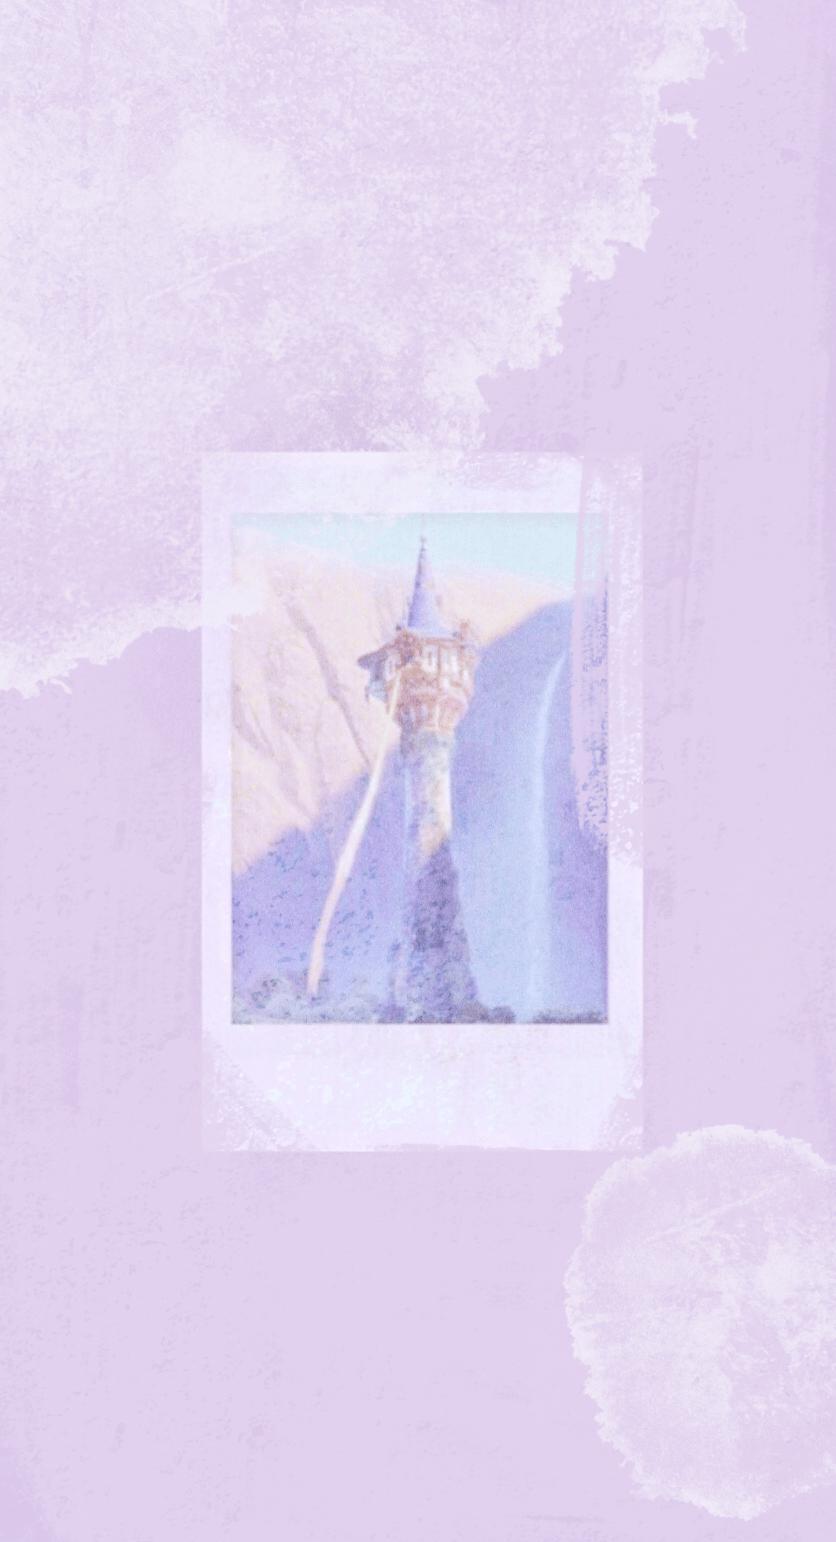 Rapunzel Aesthetic Wallpapers Top Free Rapunzel Aesthetic Backgrounds Wallpaperaccess